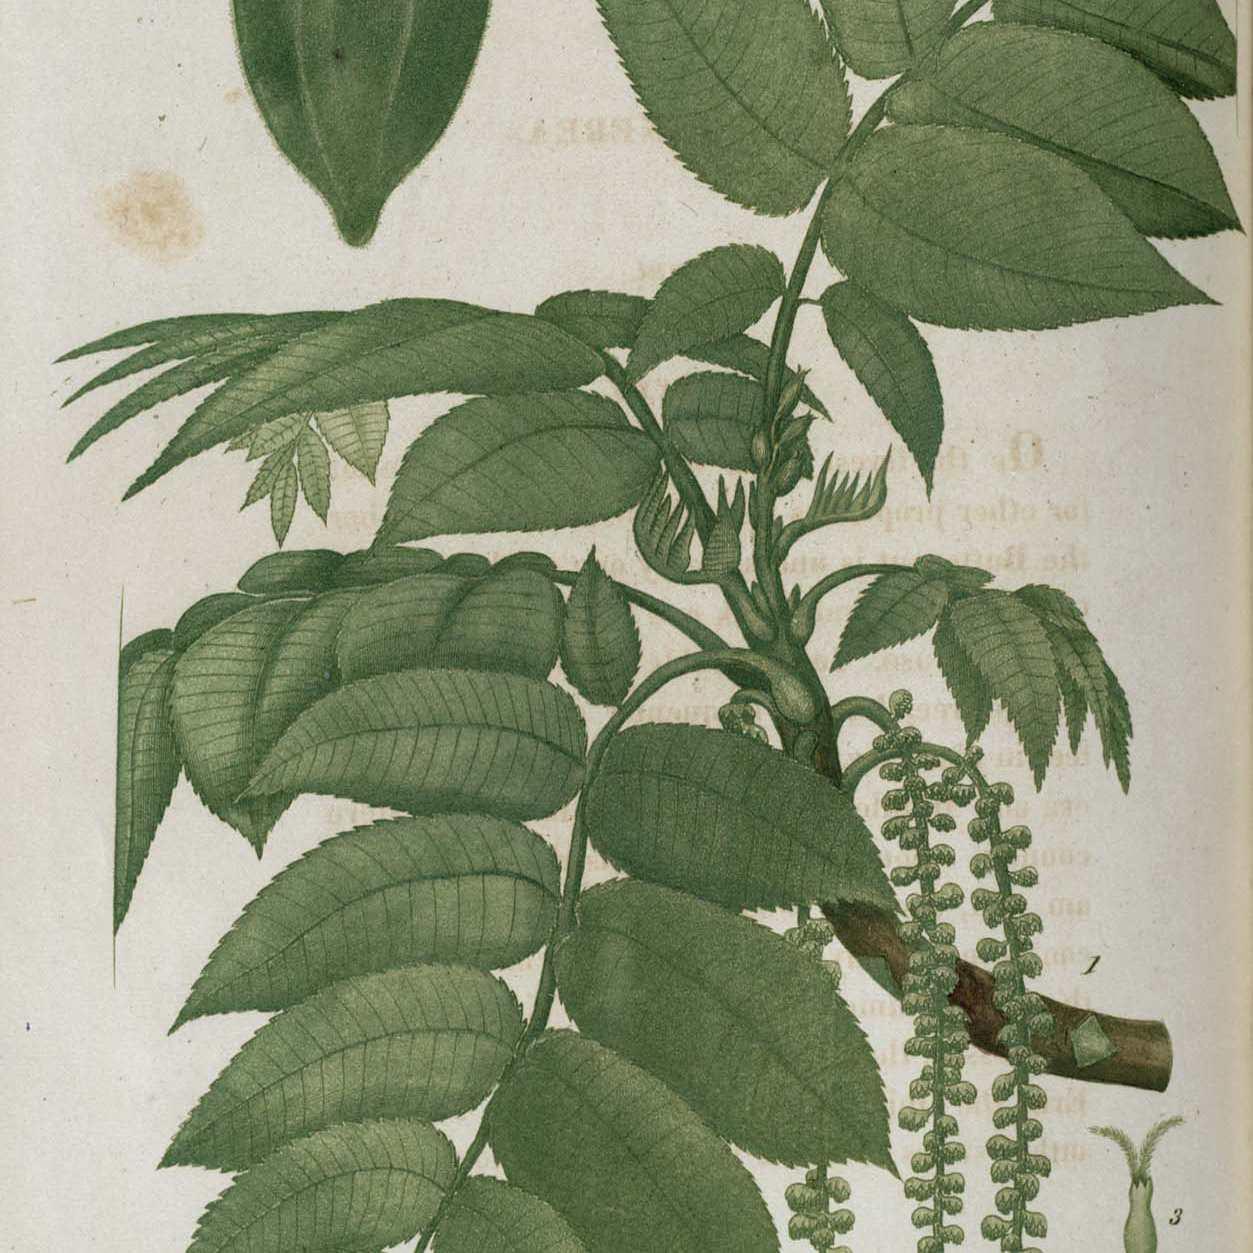 Butternut, a Common Tree in North America